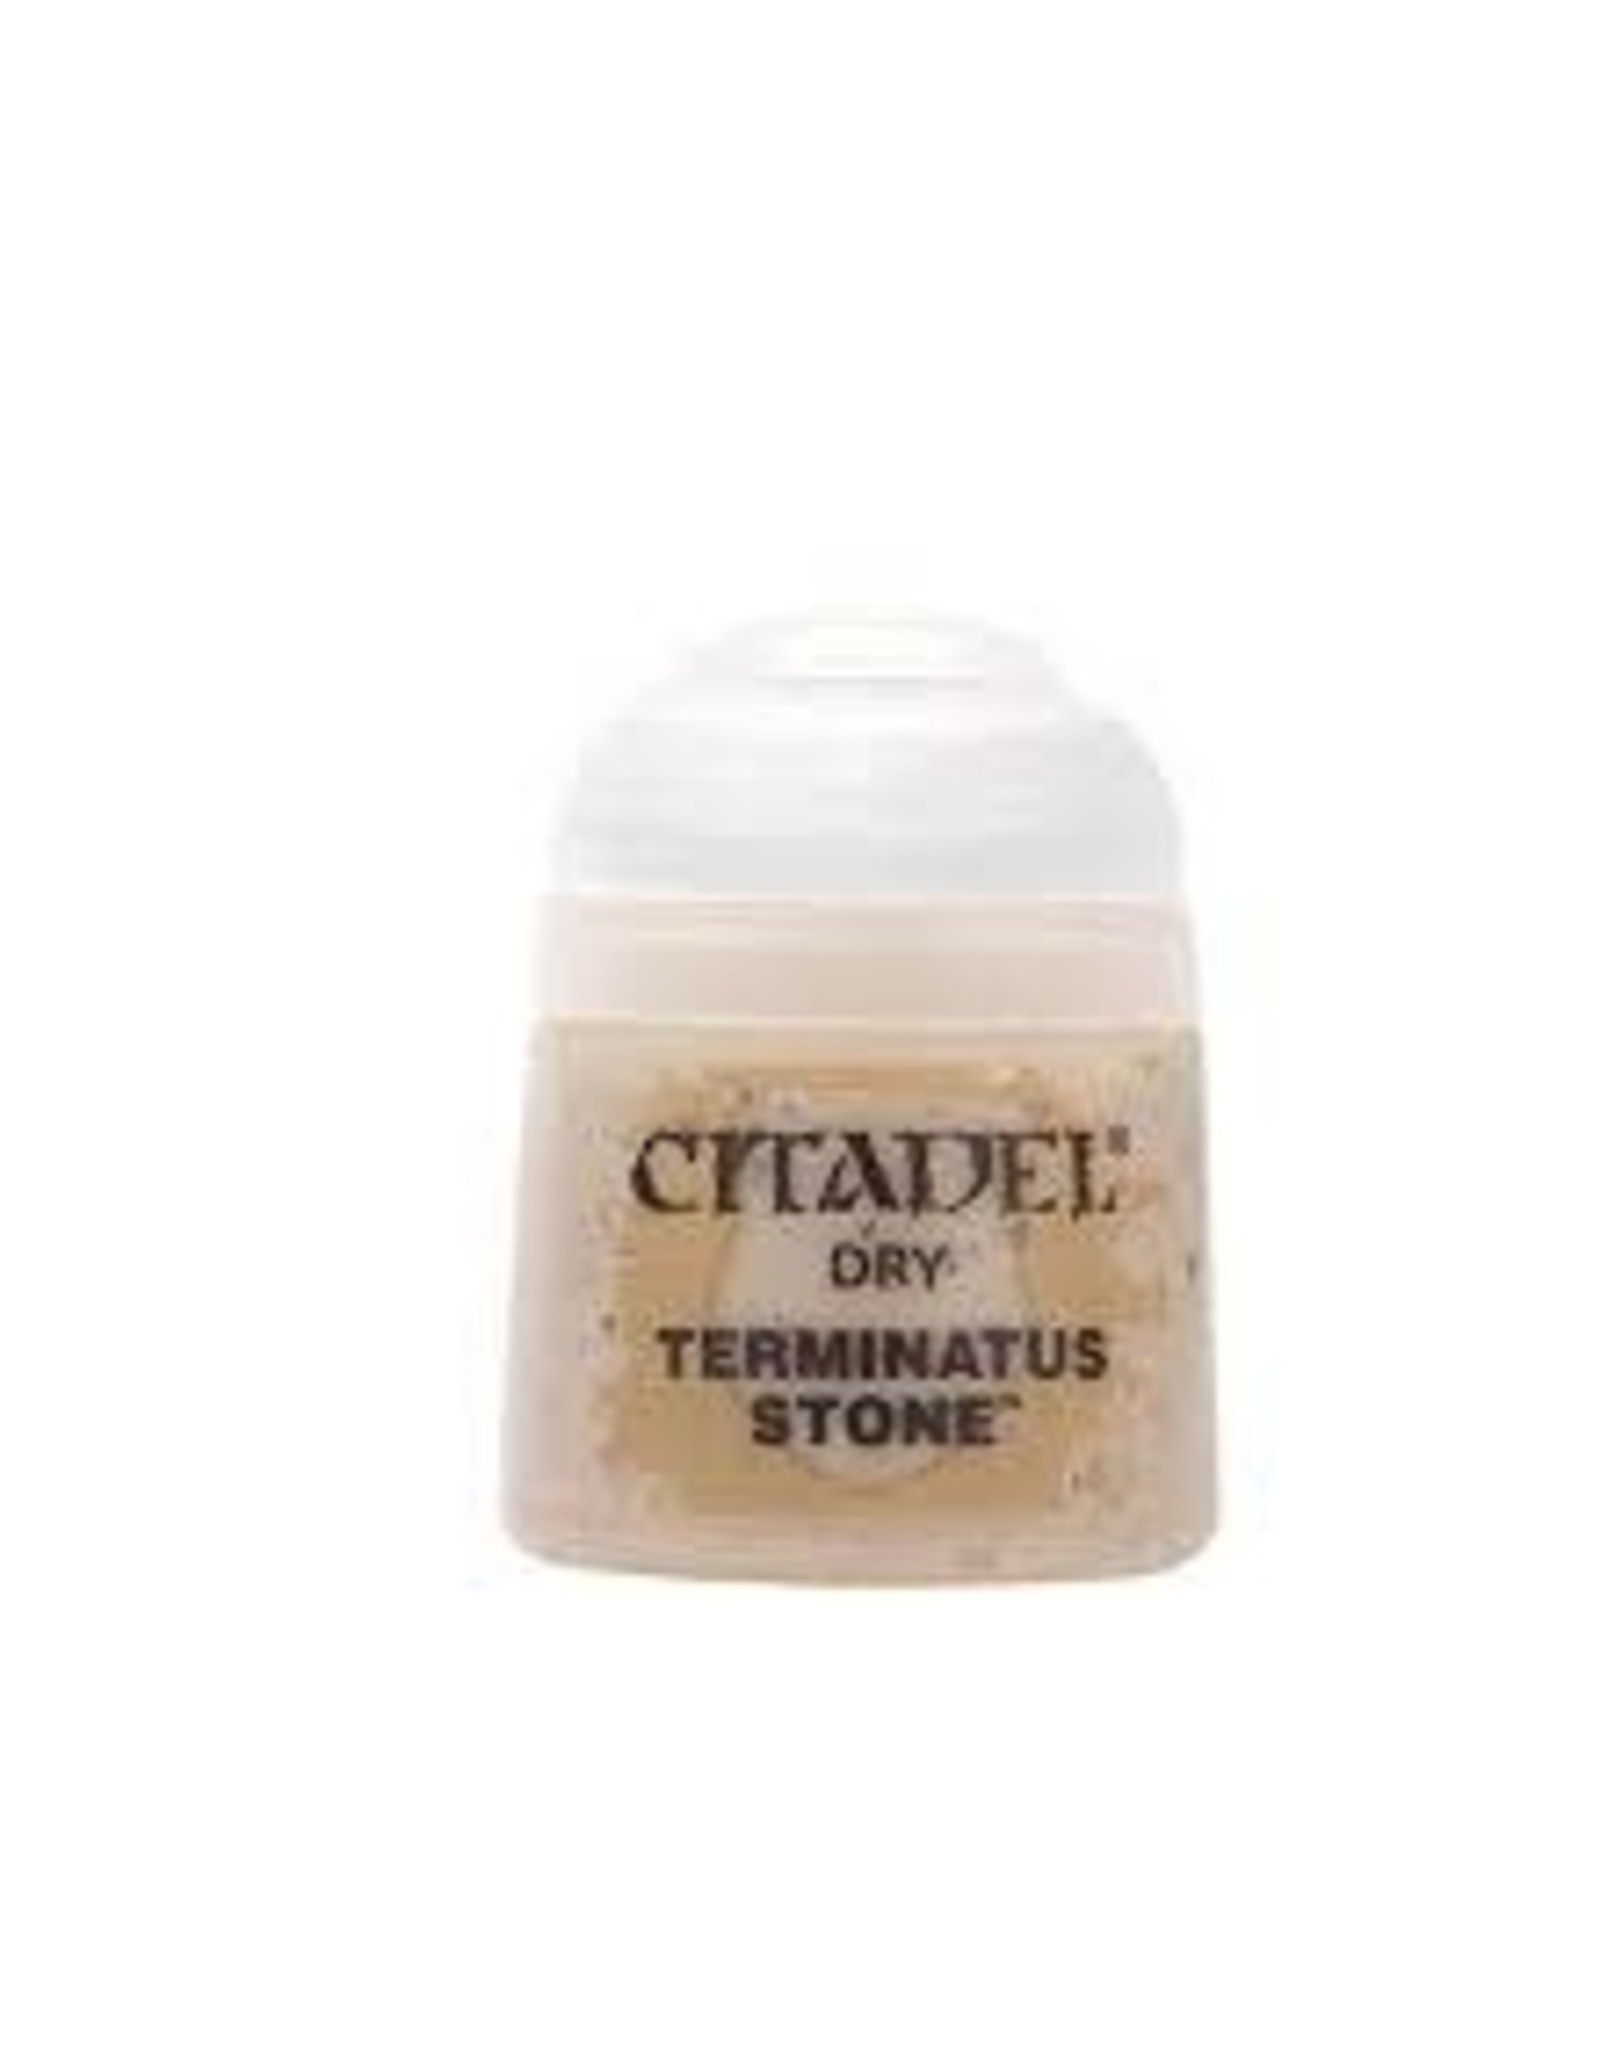 Games Workshop Citadel Paint: Terminatus Stone 12ml